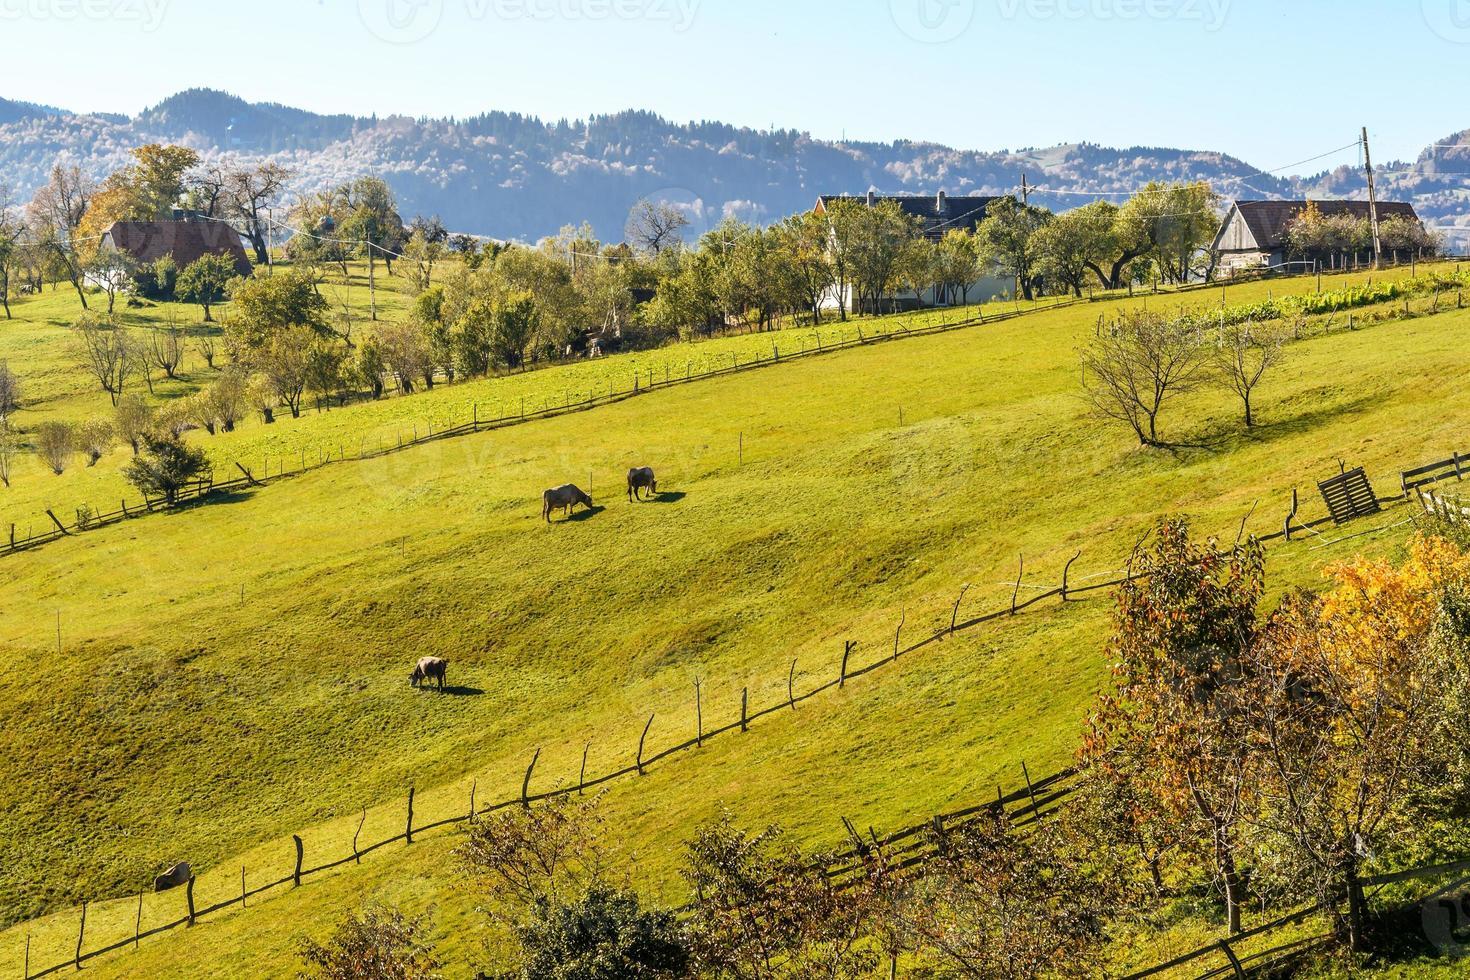 landsbygdens landskap i en rumänsk by foto